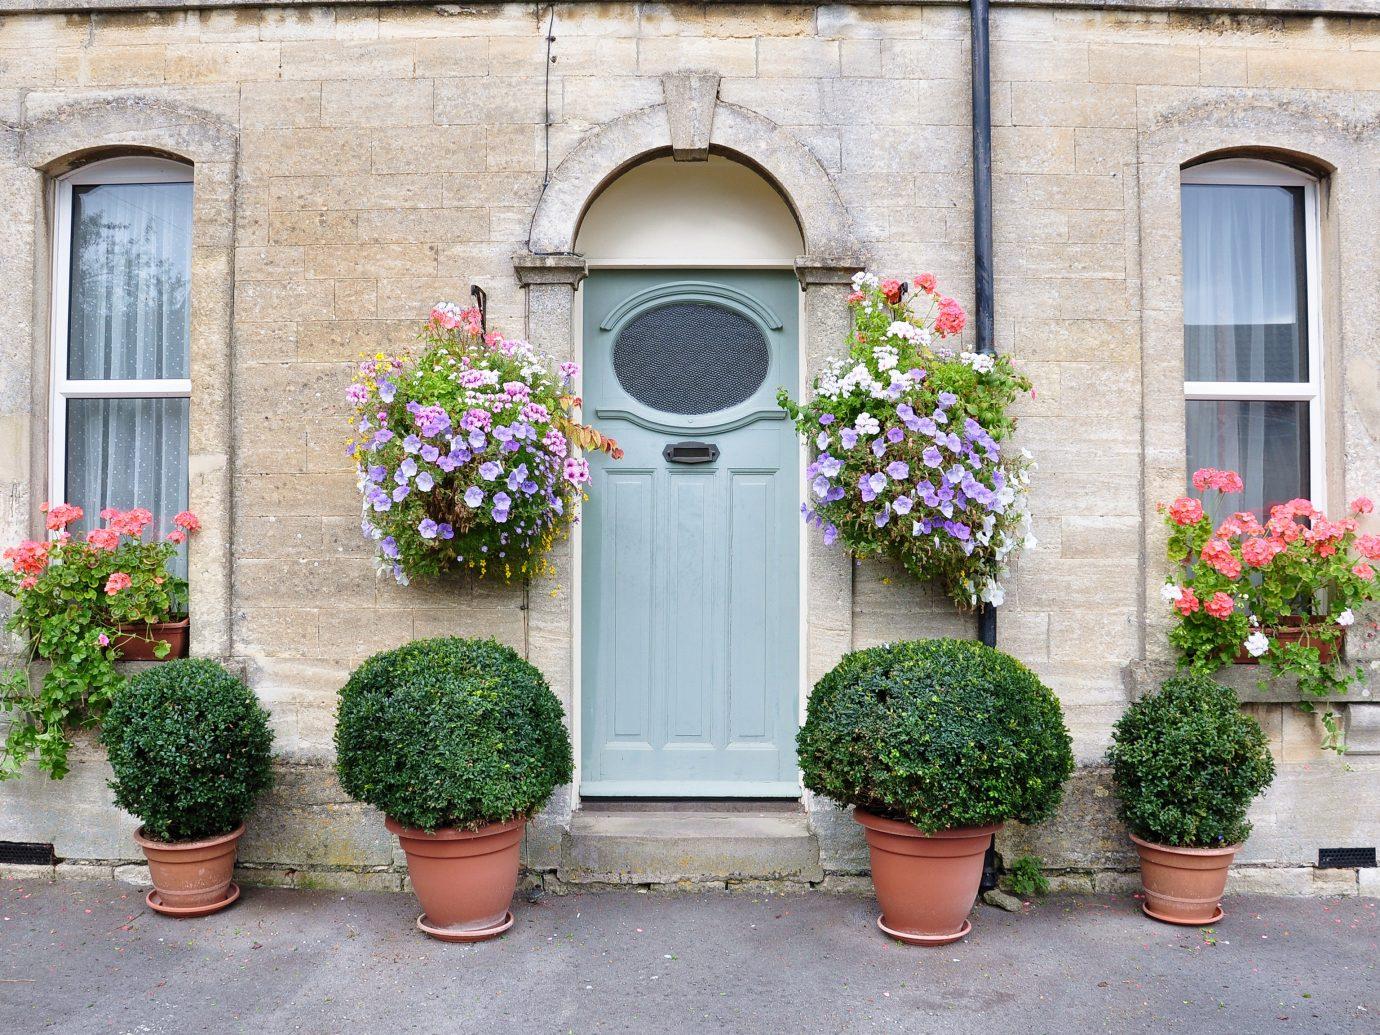 Offbeat outdoor building man made object flower green Garden plant stone home Courtyard facade door window yard arch bushes